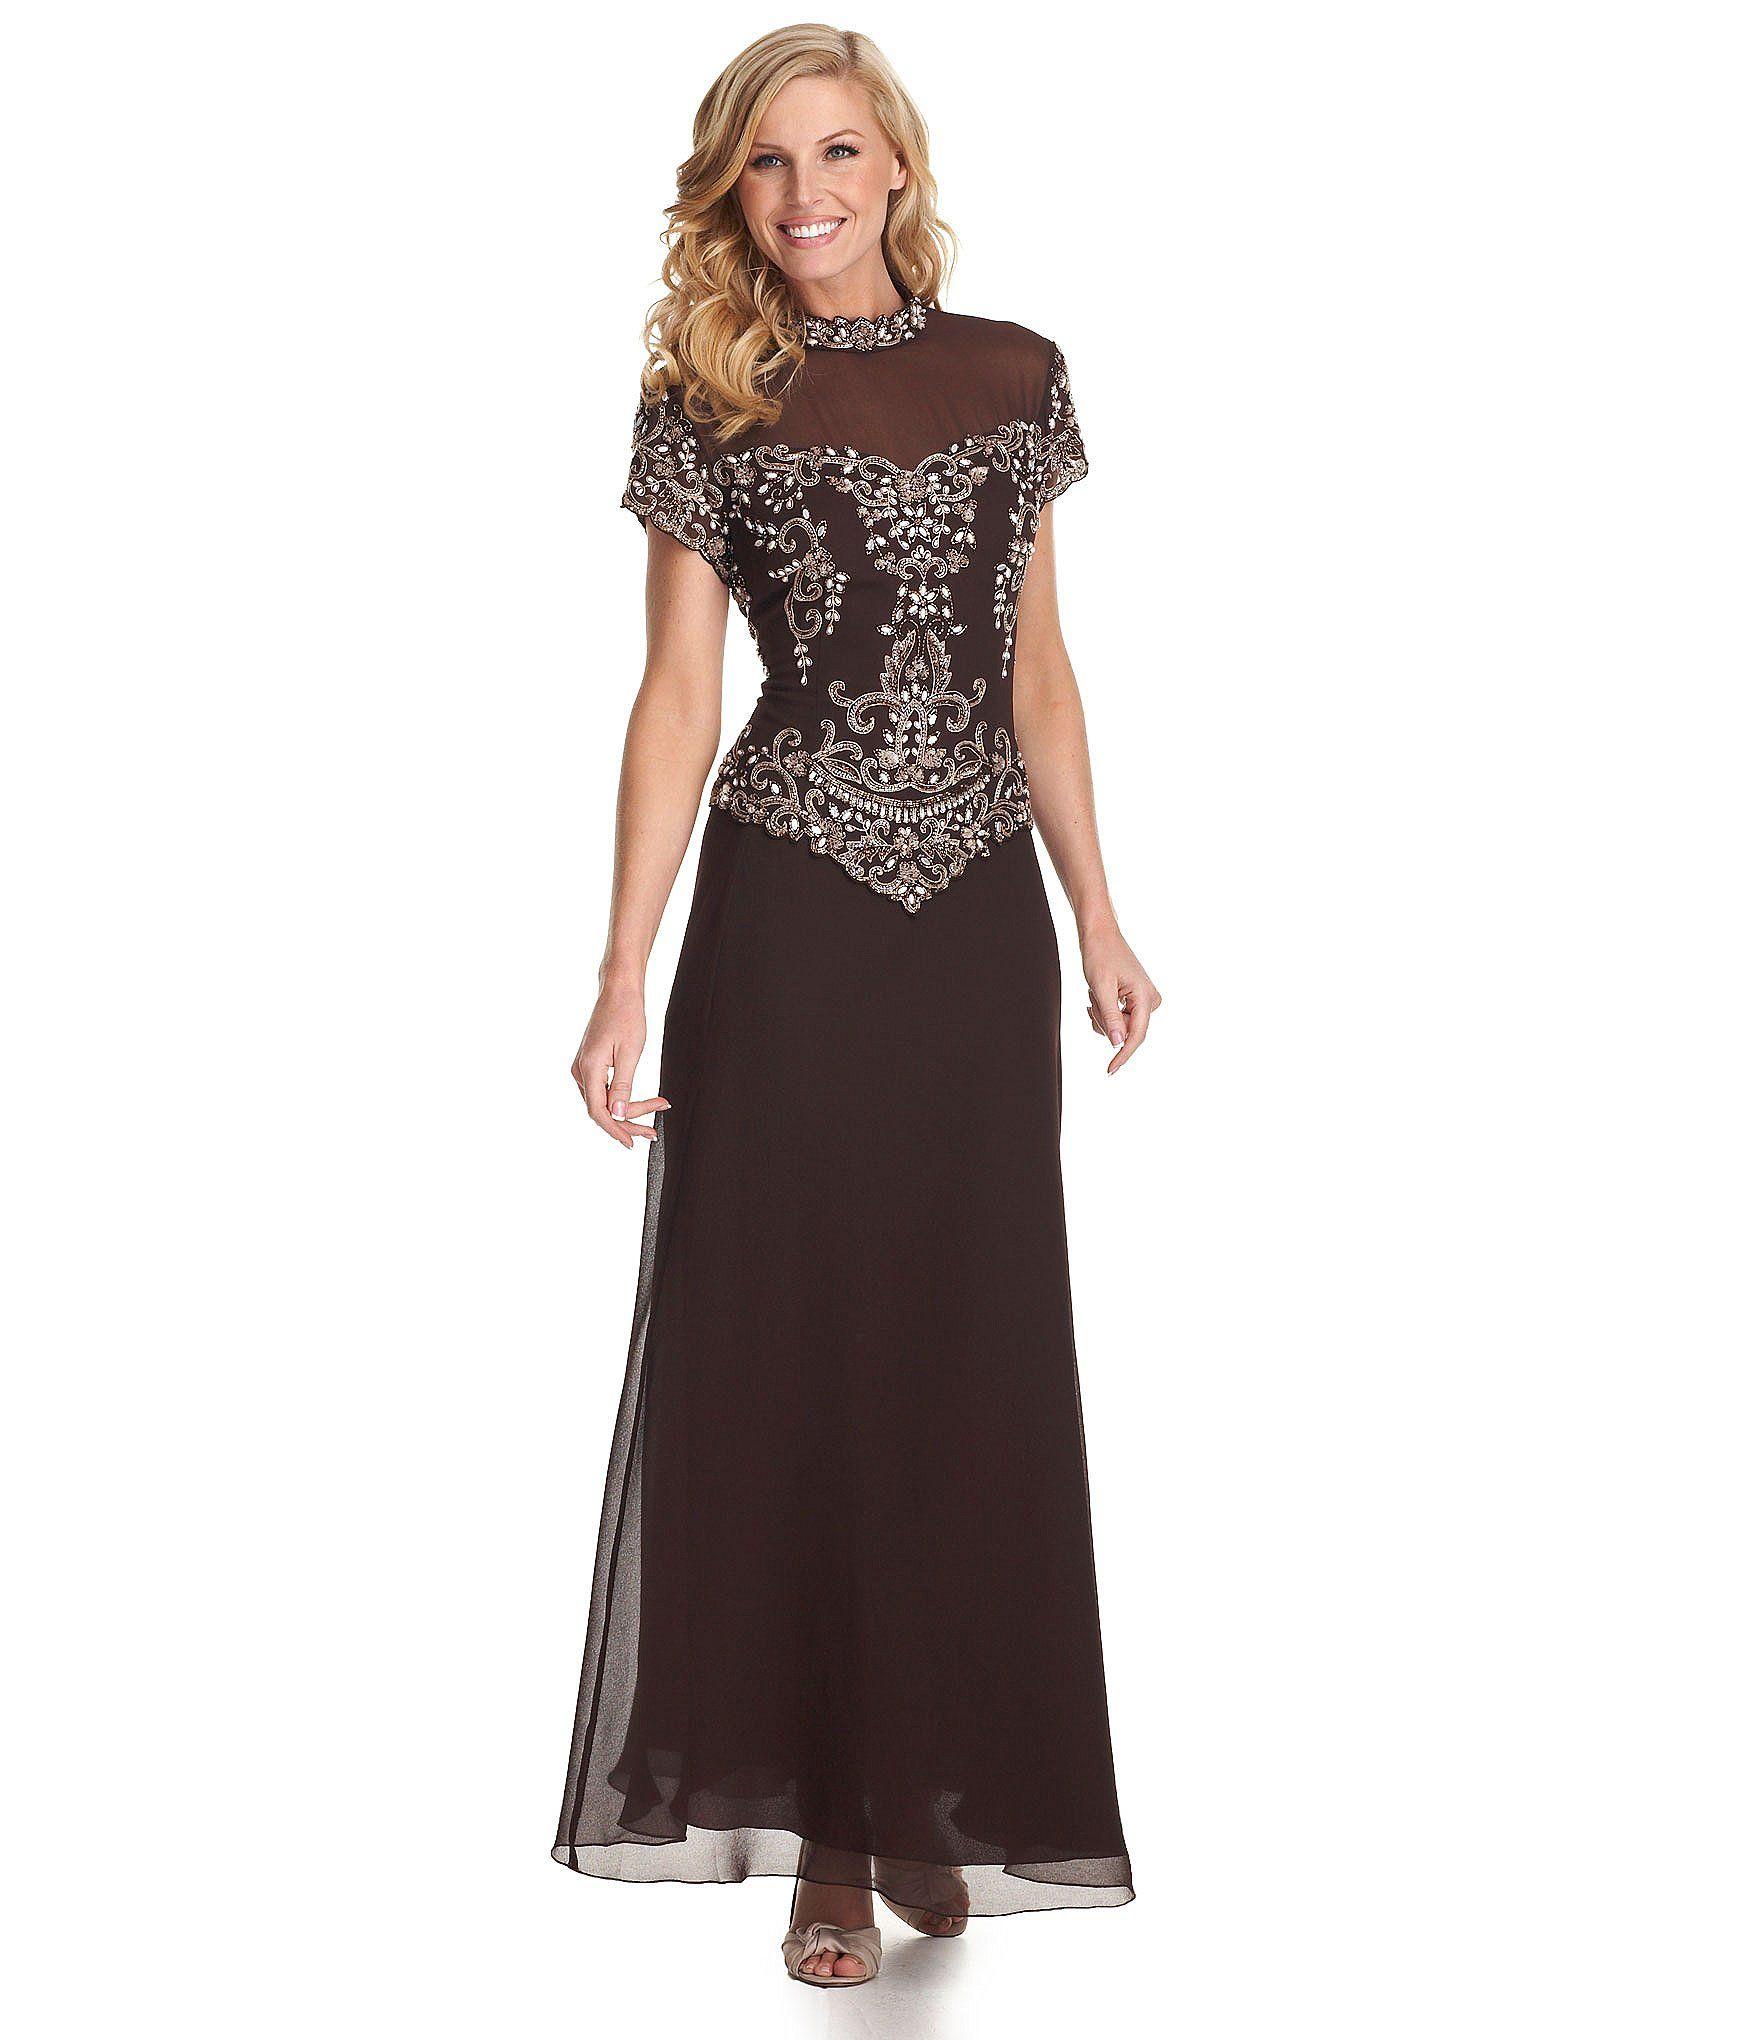 Shop for Jkara Beaded Chiffon Gown at Dillards.com. Visit Dillards ...